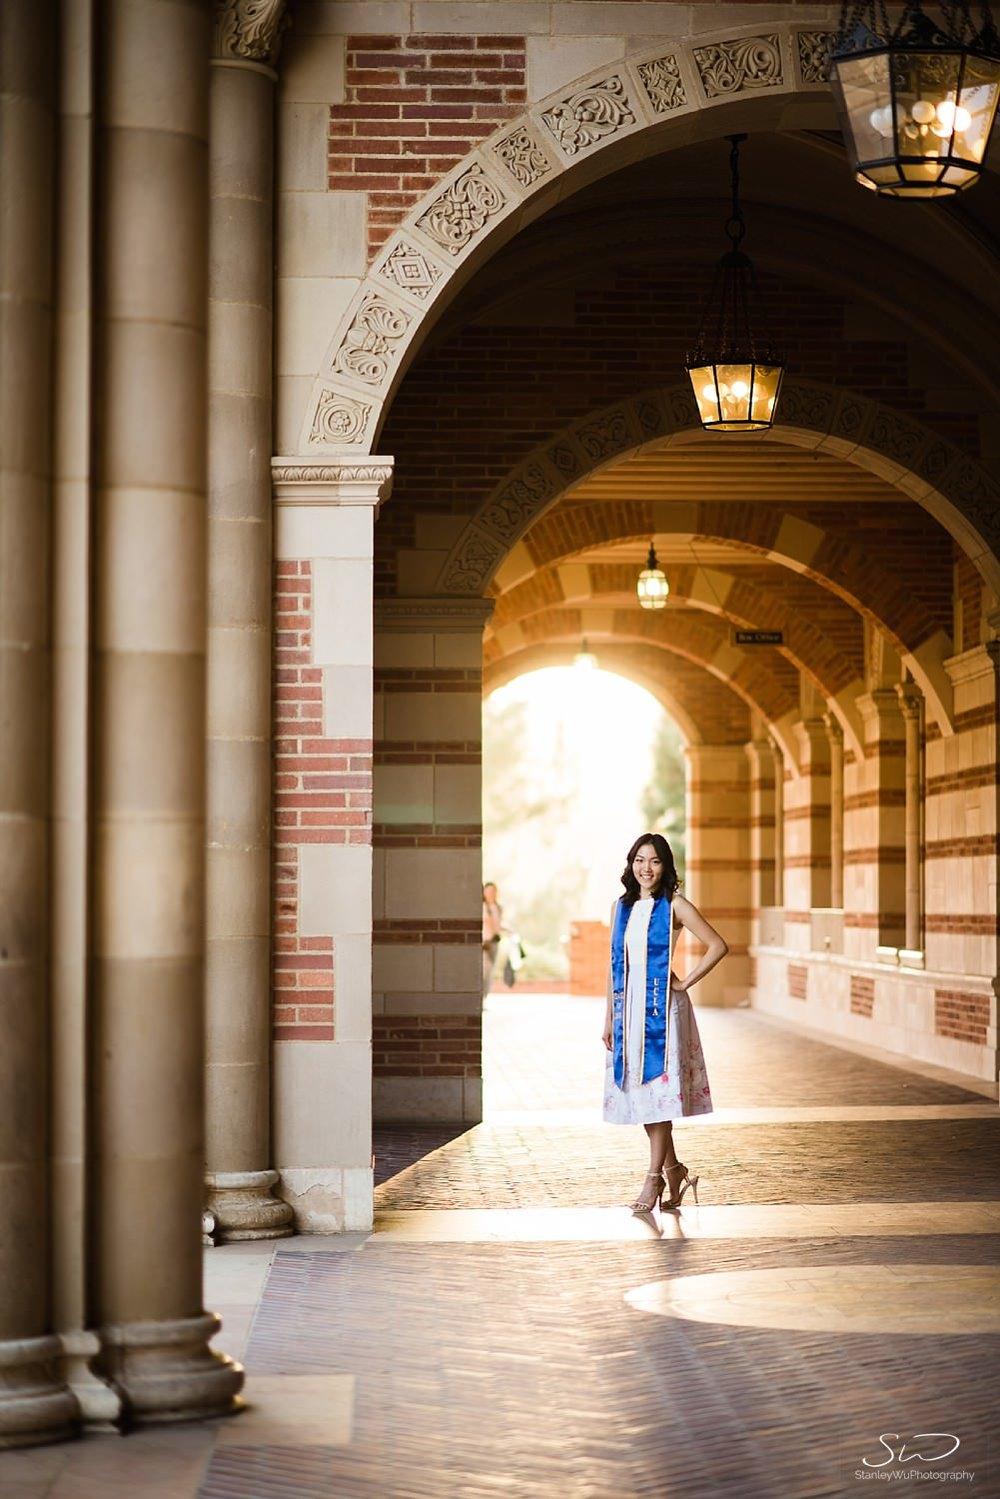 ucla-fashion-graduation-portrait-senior-session_0081.jpg